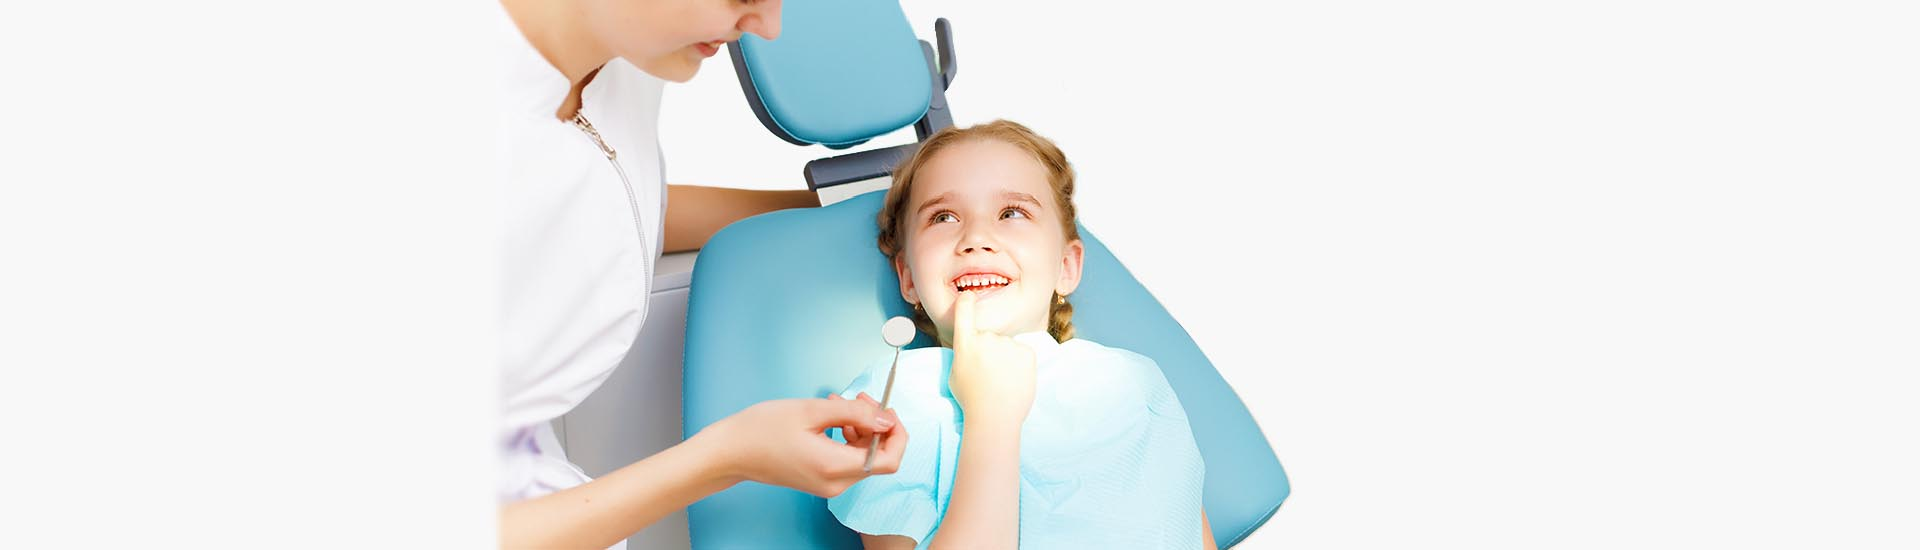 Pediatric Dentist in Seattle, Ballard, WA, Shoreline, Greenwood, WA, Fremont, WA